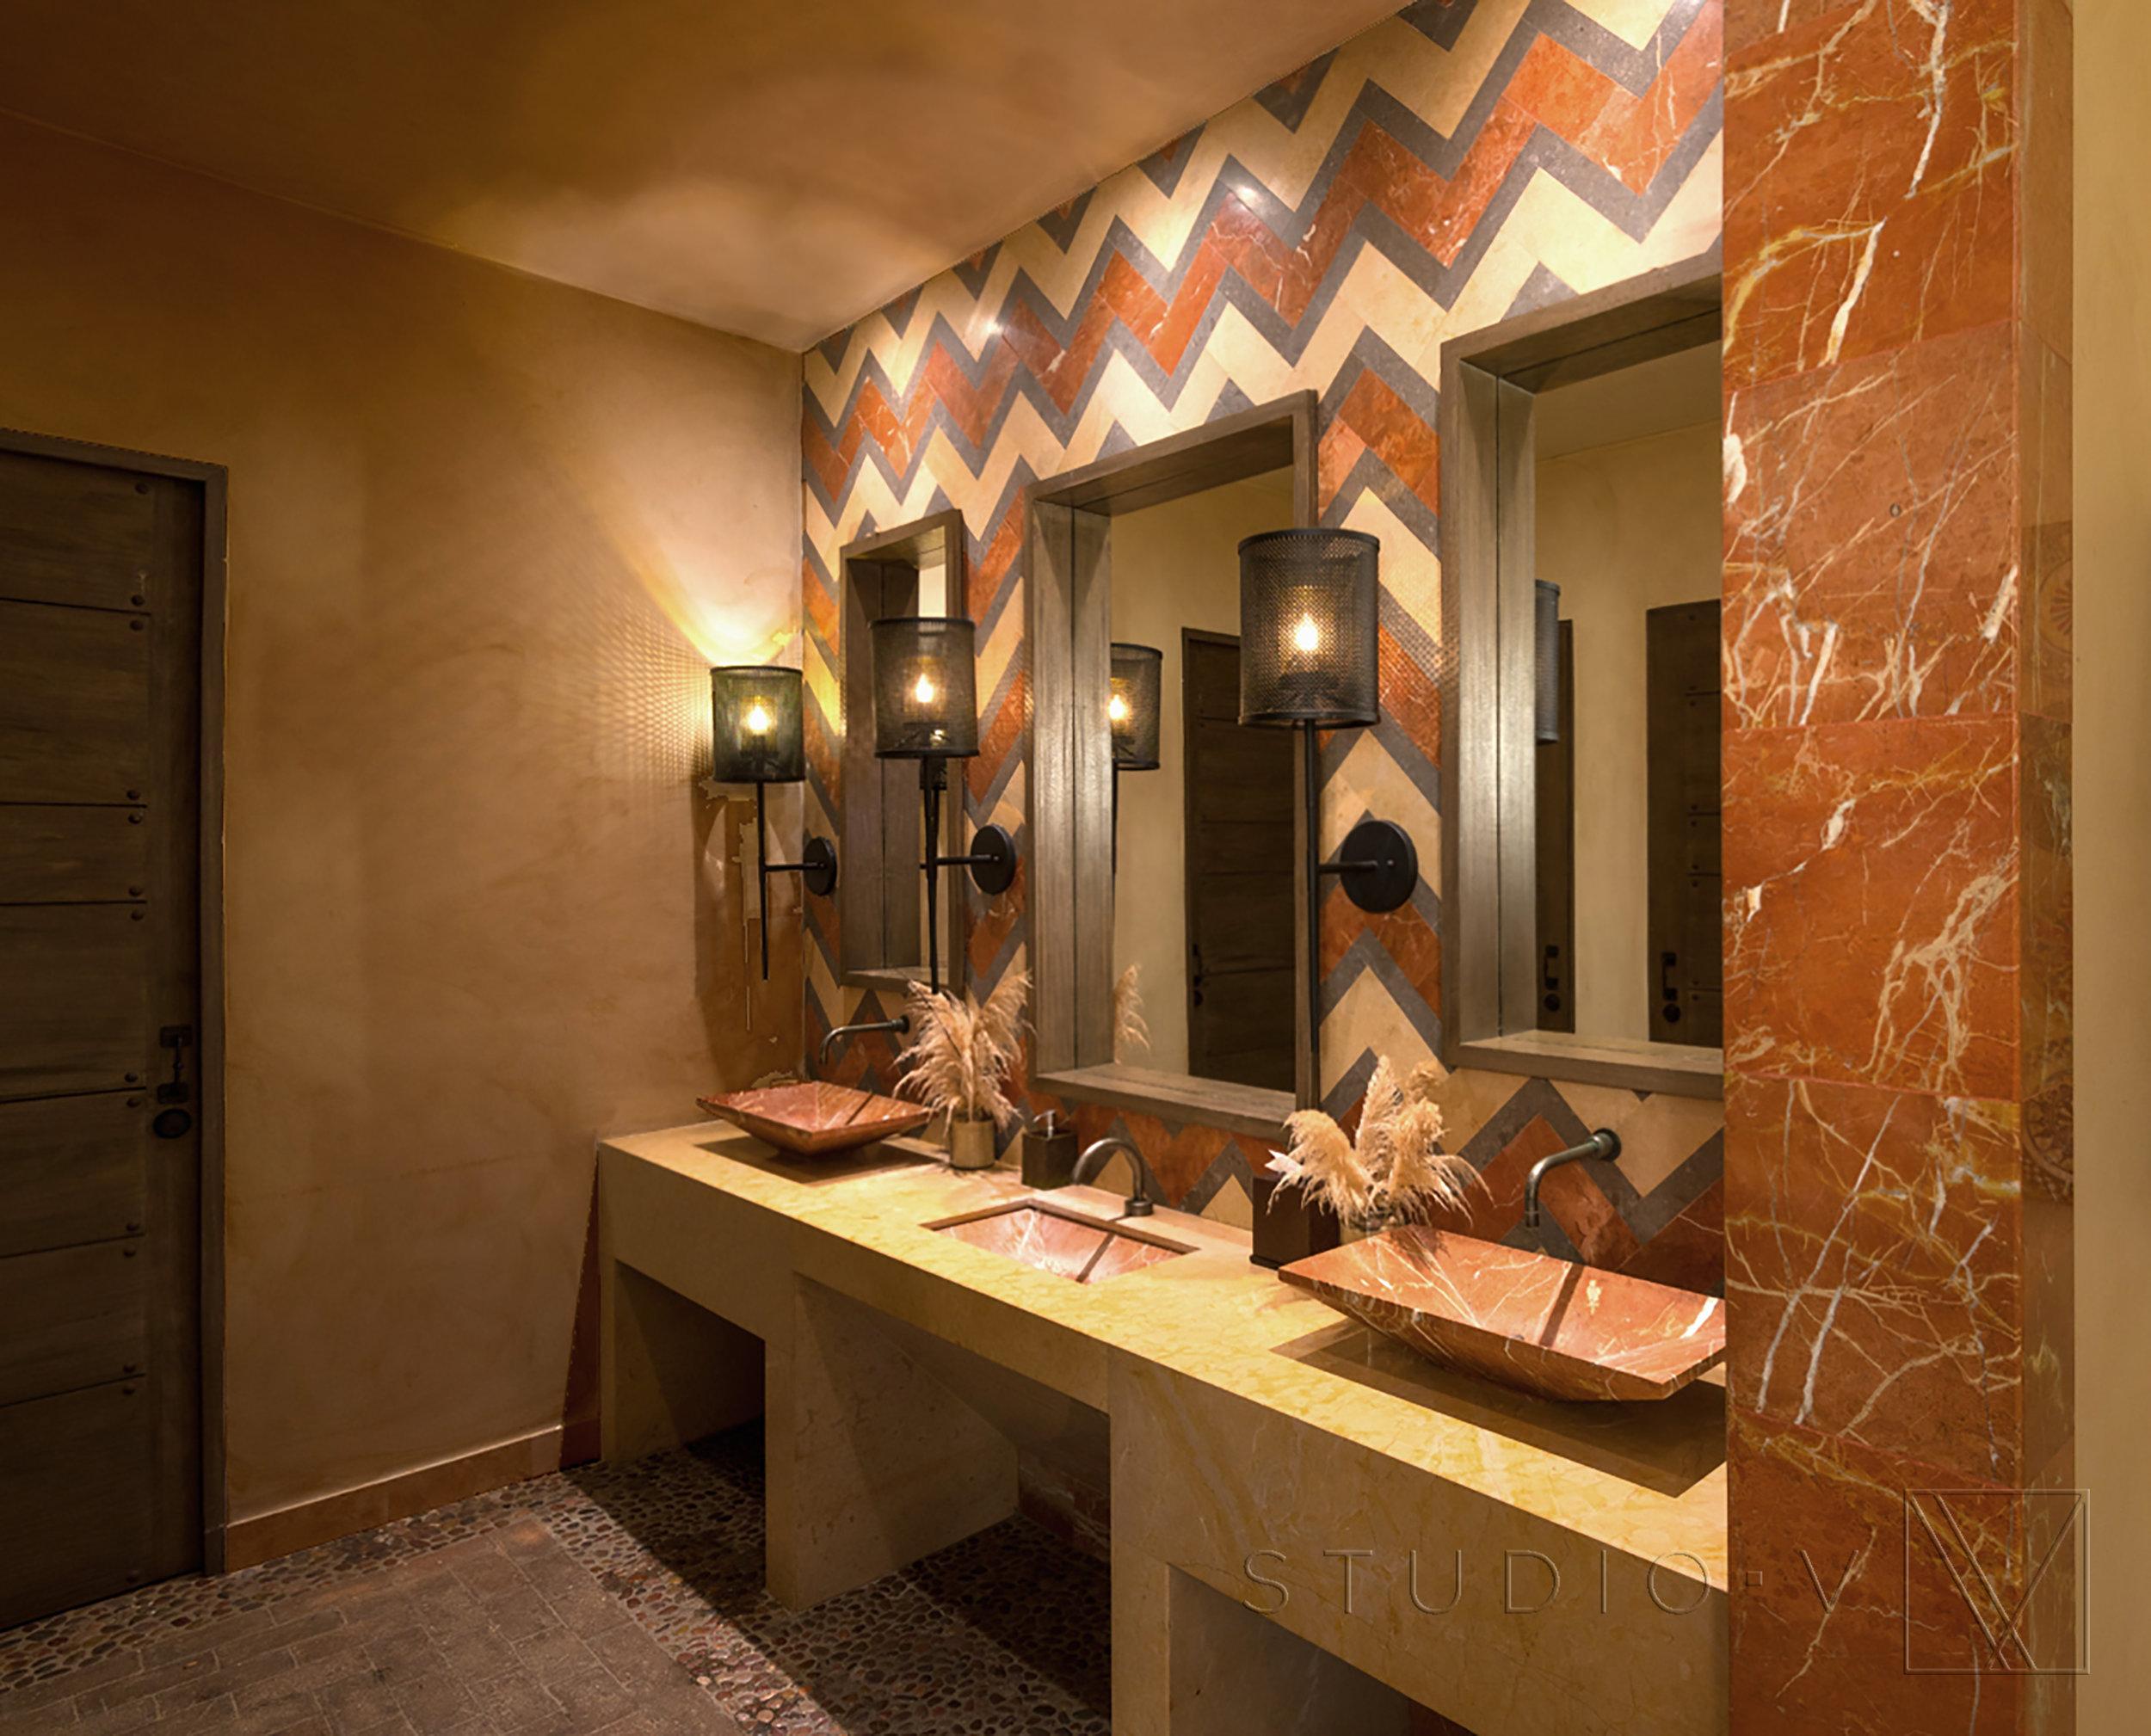 Quivira Clubhouse Sunset Beach Cabo San Lucas Studio V Interior Architecture and Design Scottsdale Arizona AZ (18).jpg